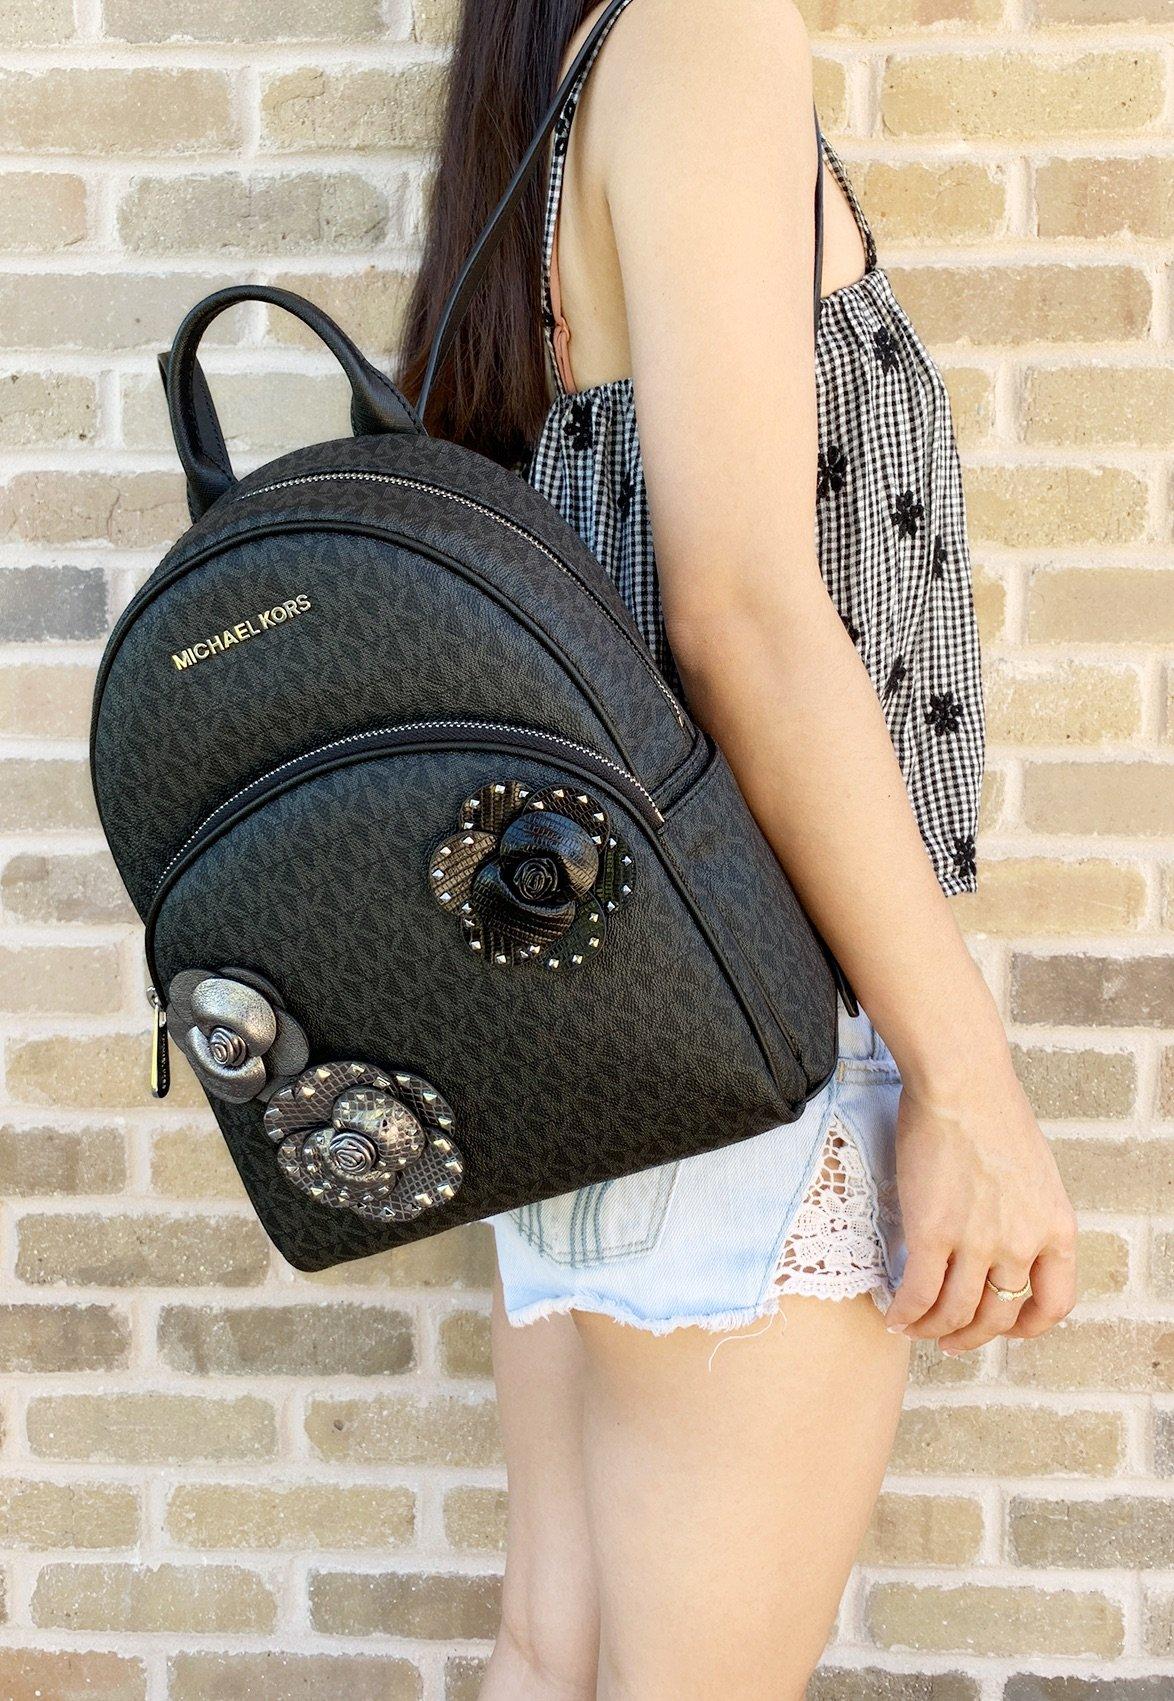 fb5acd93a6e8ab Details about Michael Kors Abbey Medium Backpack Black MK Signature Flower  School Bag